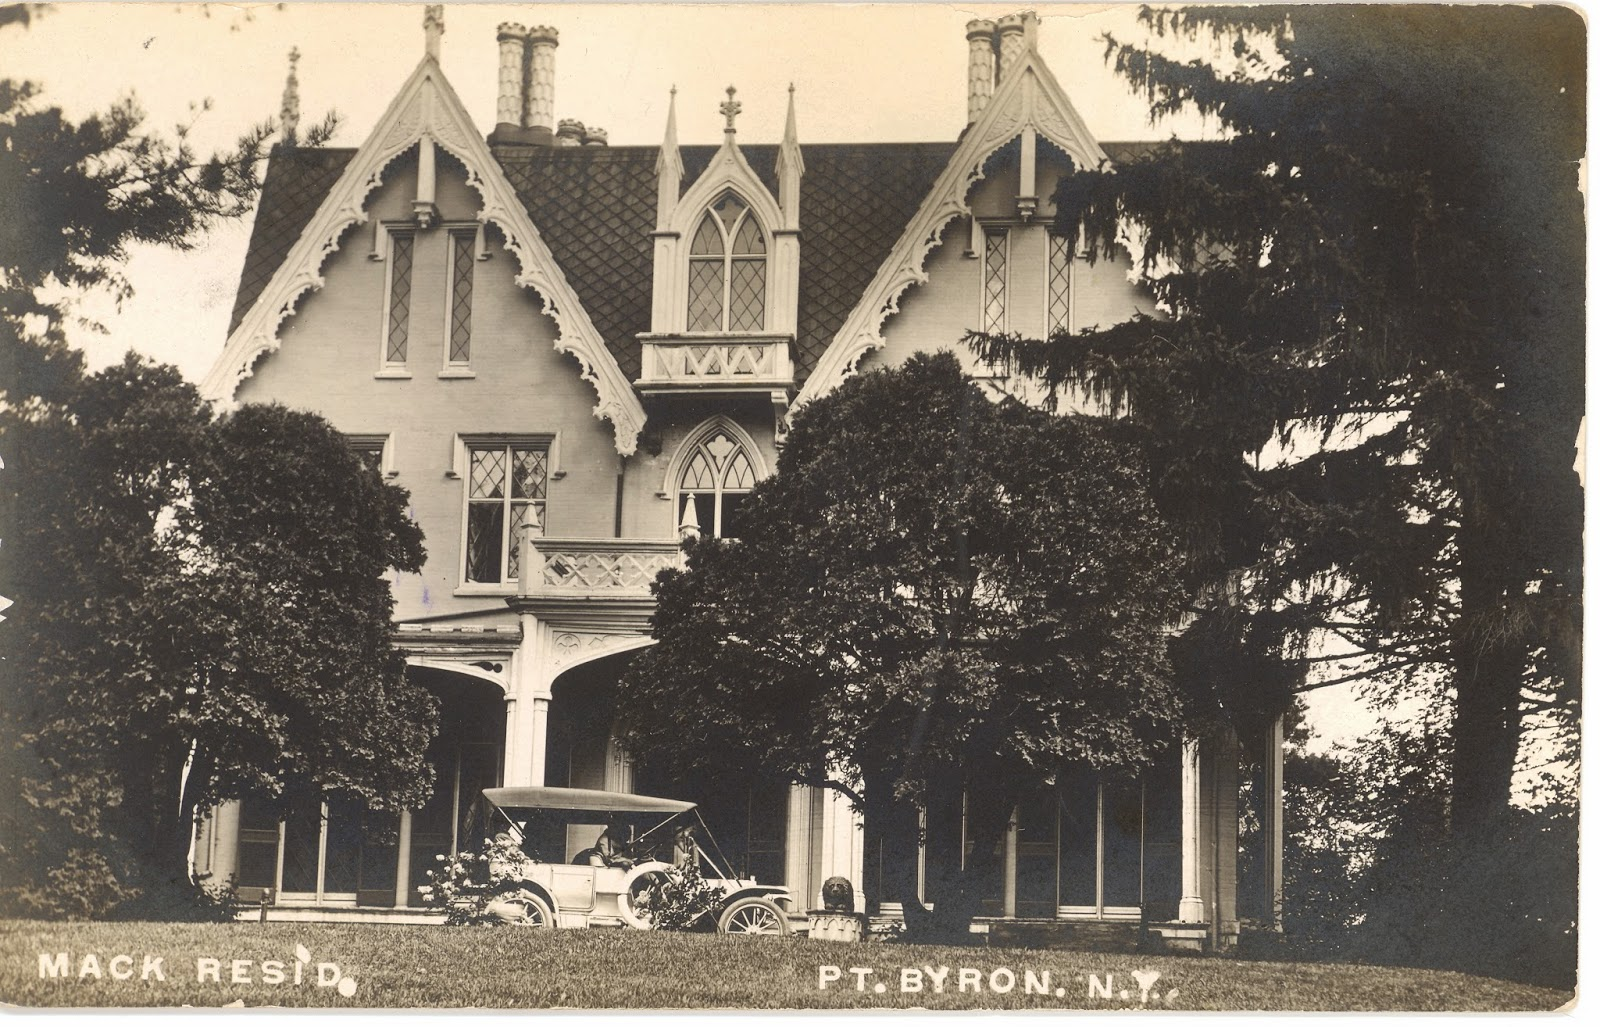 Lock 52 Historical Society of Port Byron NY WIlliam